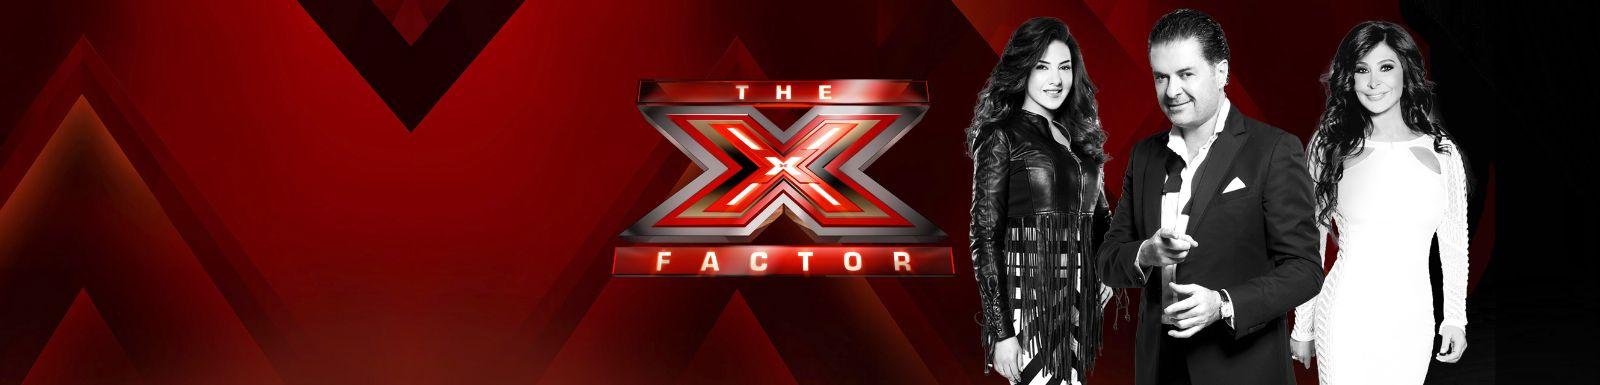 ���� ������ The X Factor ������ 2015 ��� MBC